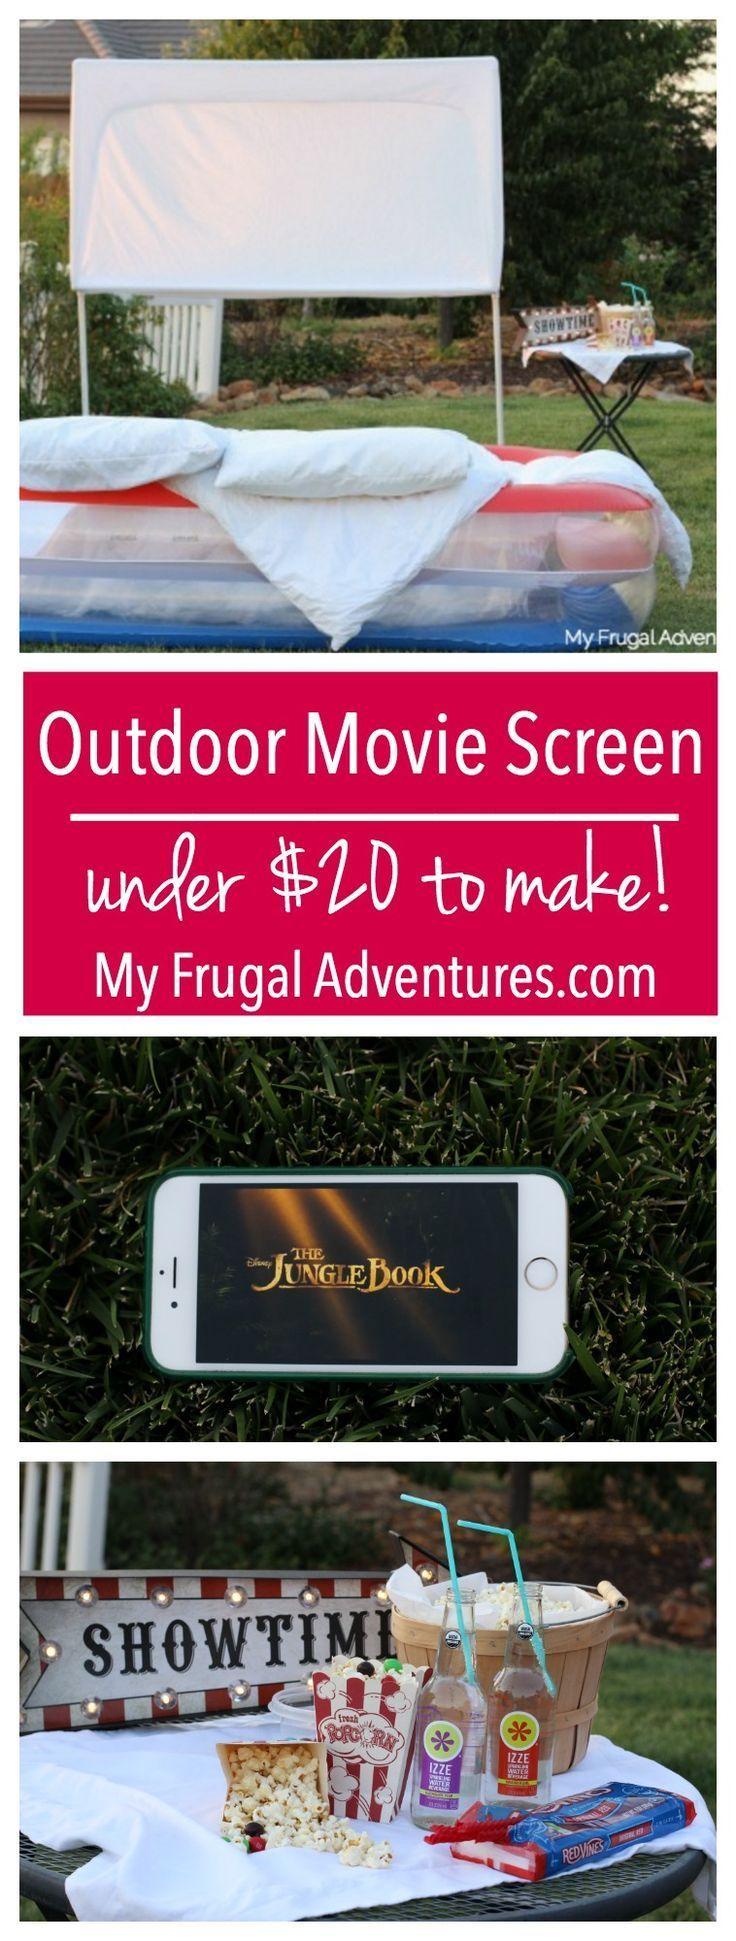 best 25 outdoor movie screen ideas on pinterest outdoor projector screen diy backyard movie. Black Bedroom Furniture Sets. Home Design Ideas